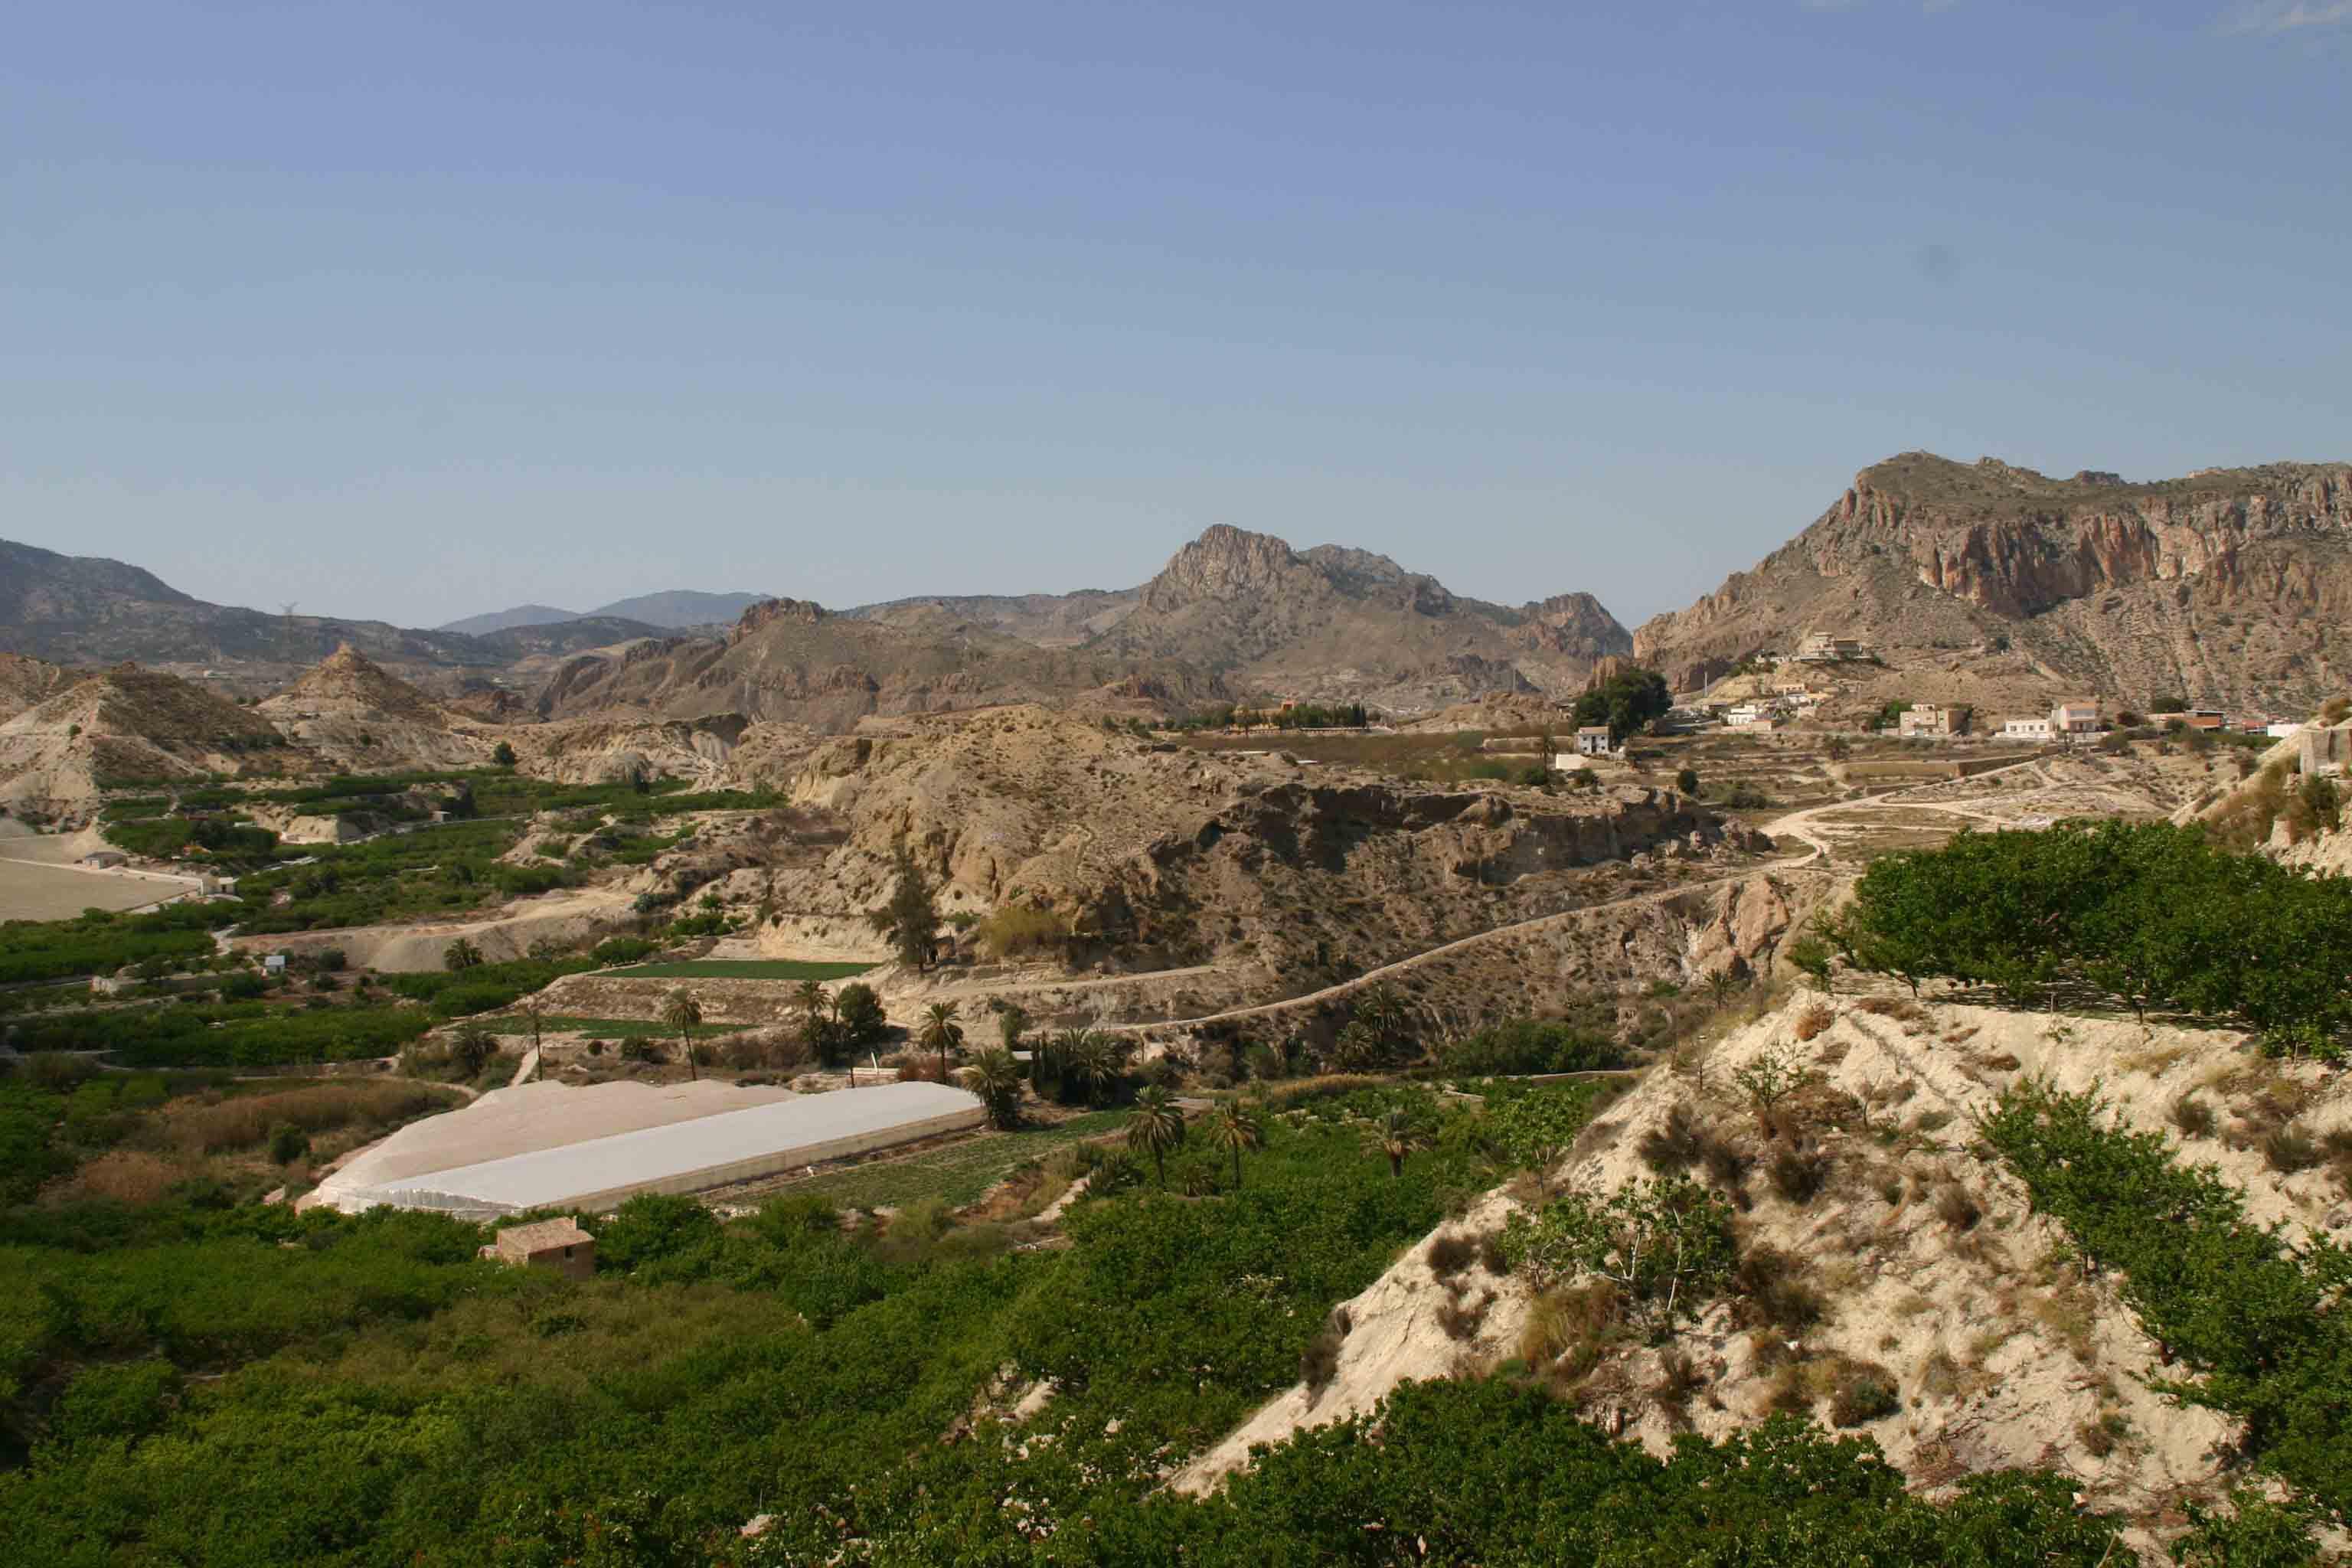 Barren landscape close to the town of Archena